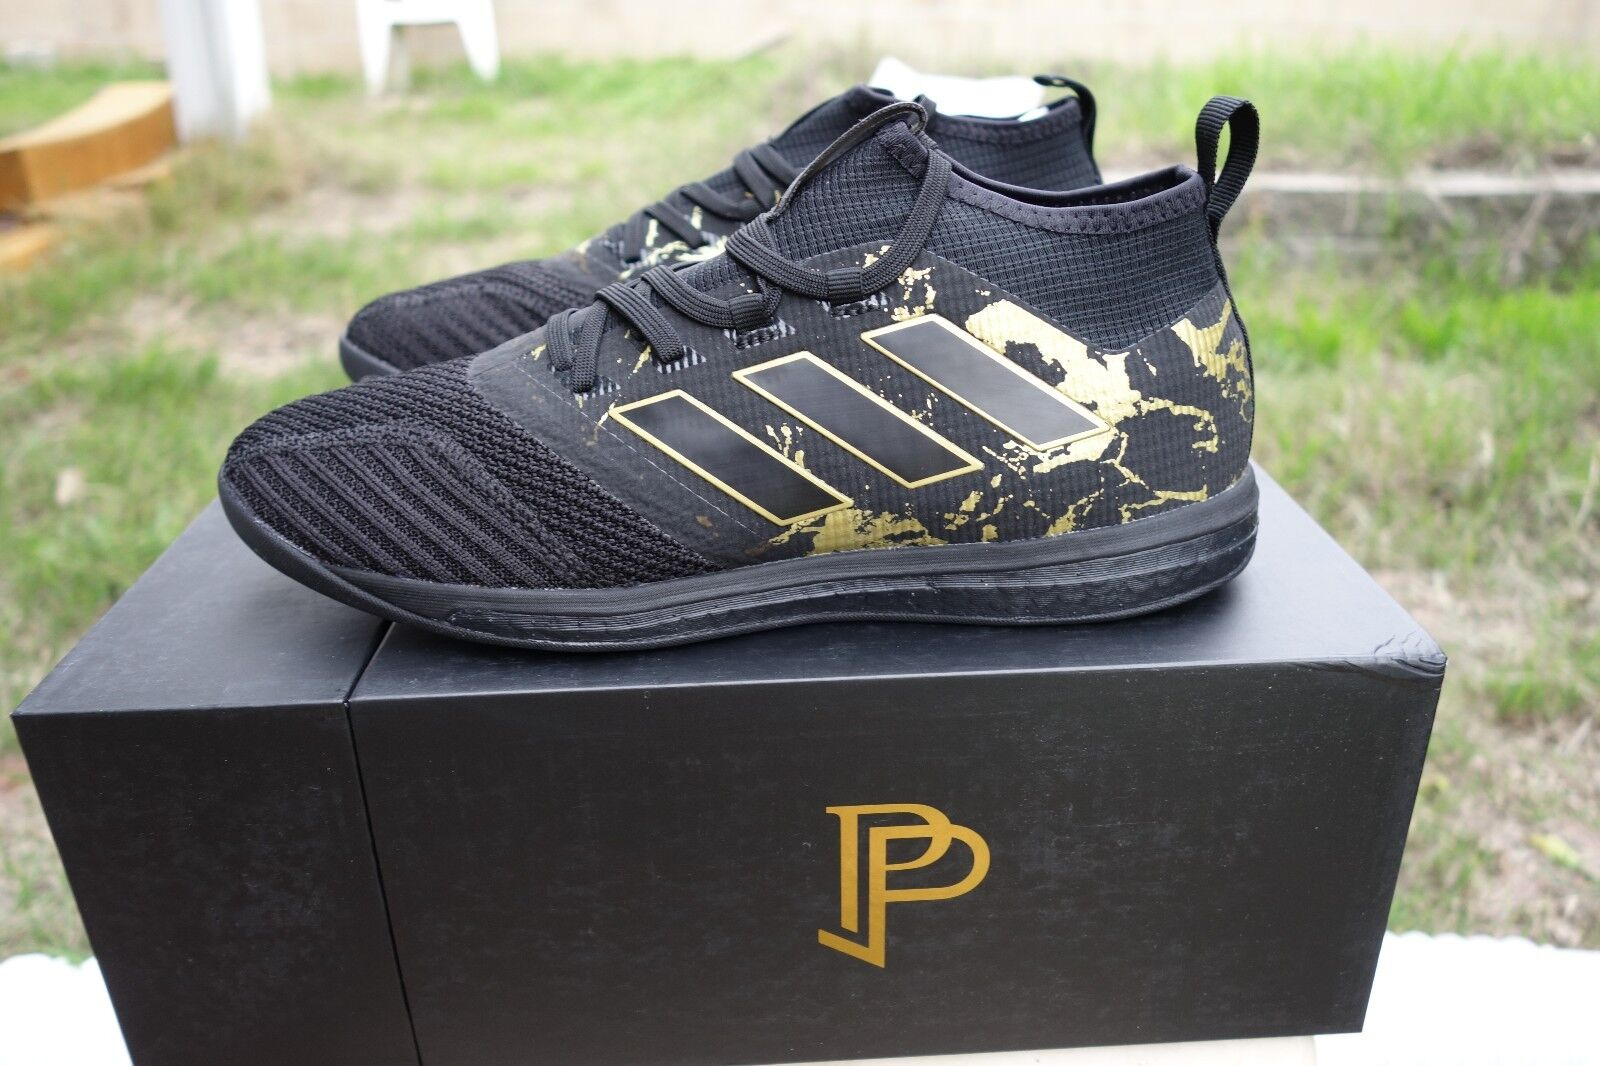 Adidas x Paul Pogba PP Ace Tango 17.1 TR BY9161 size 9.5